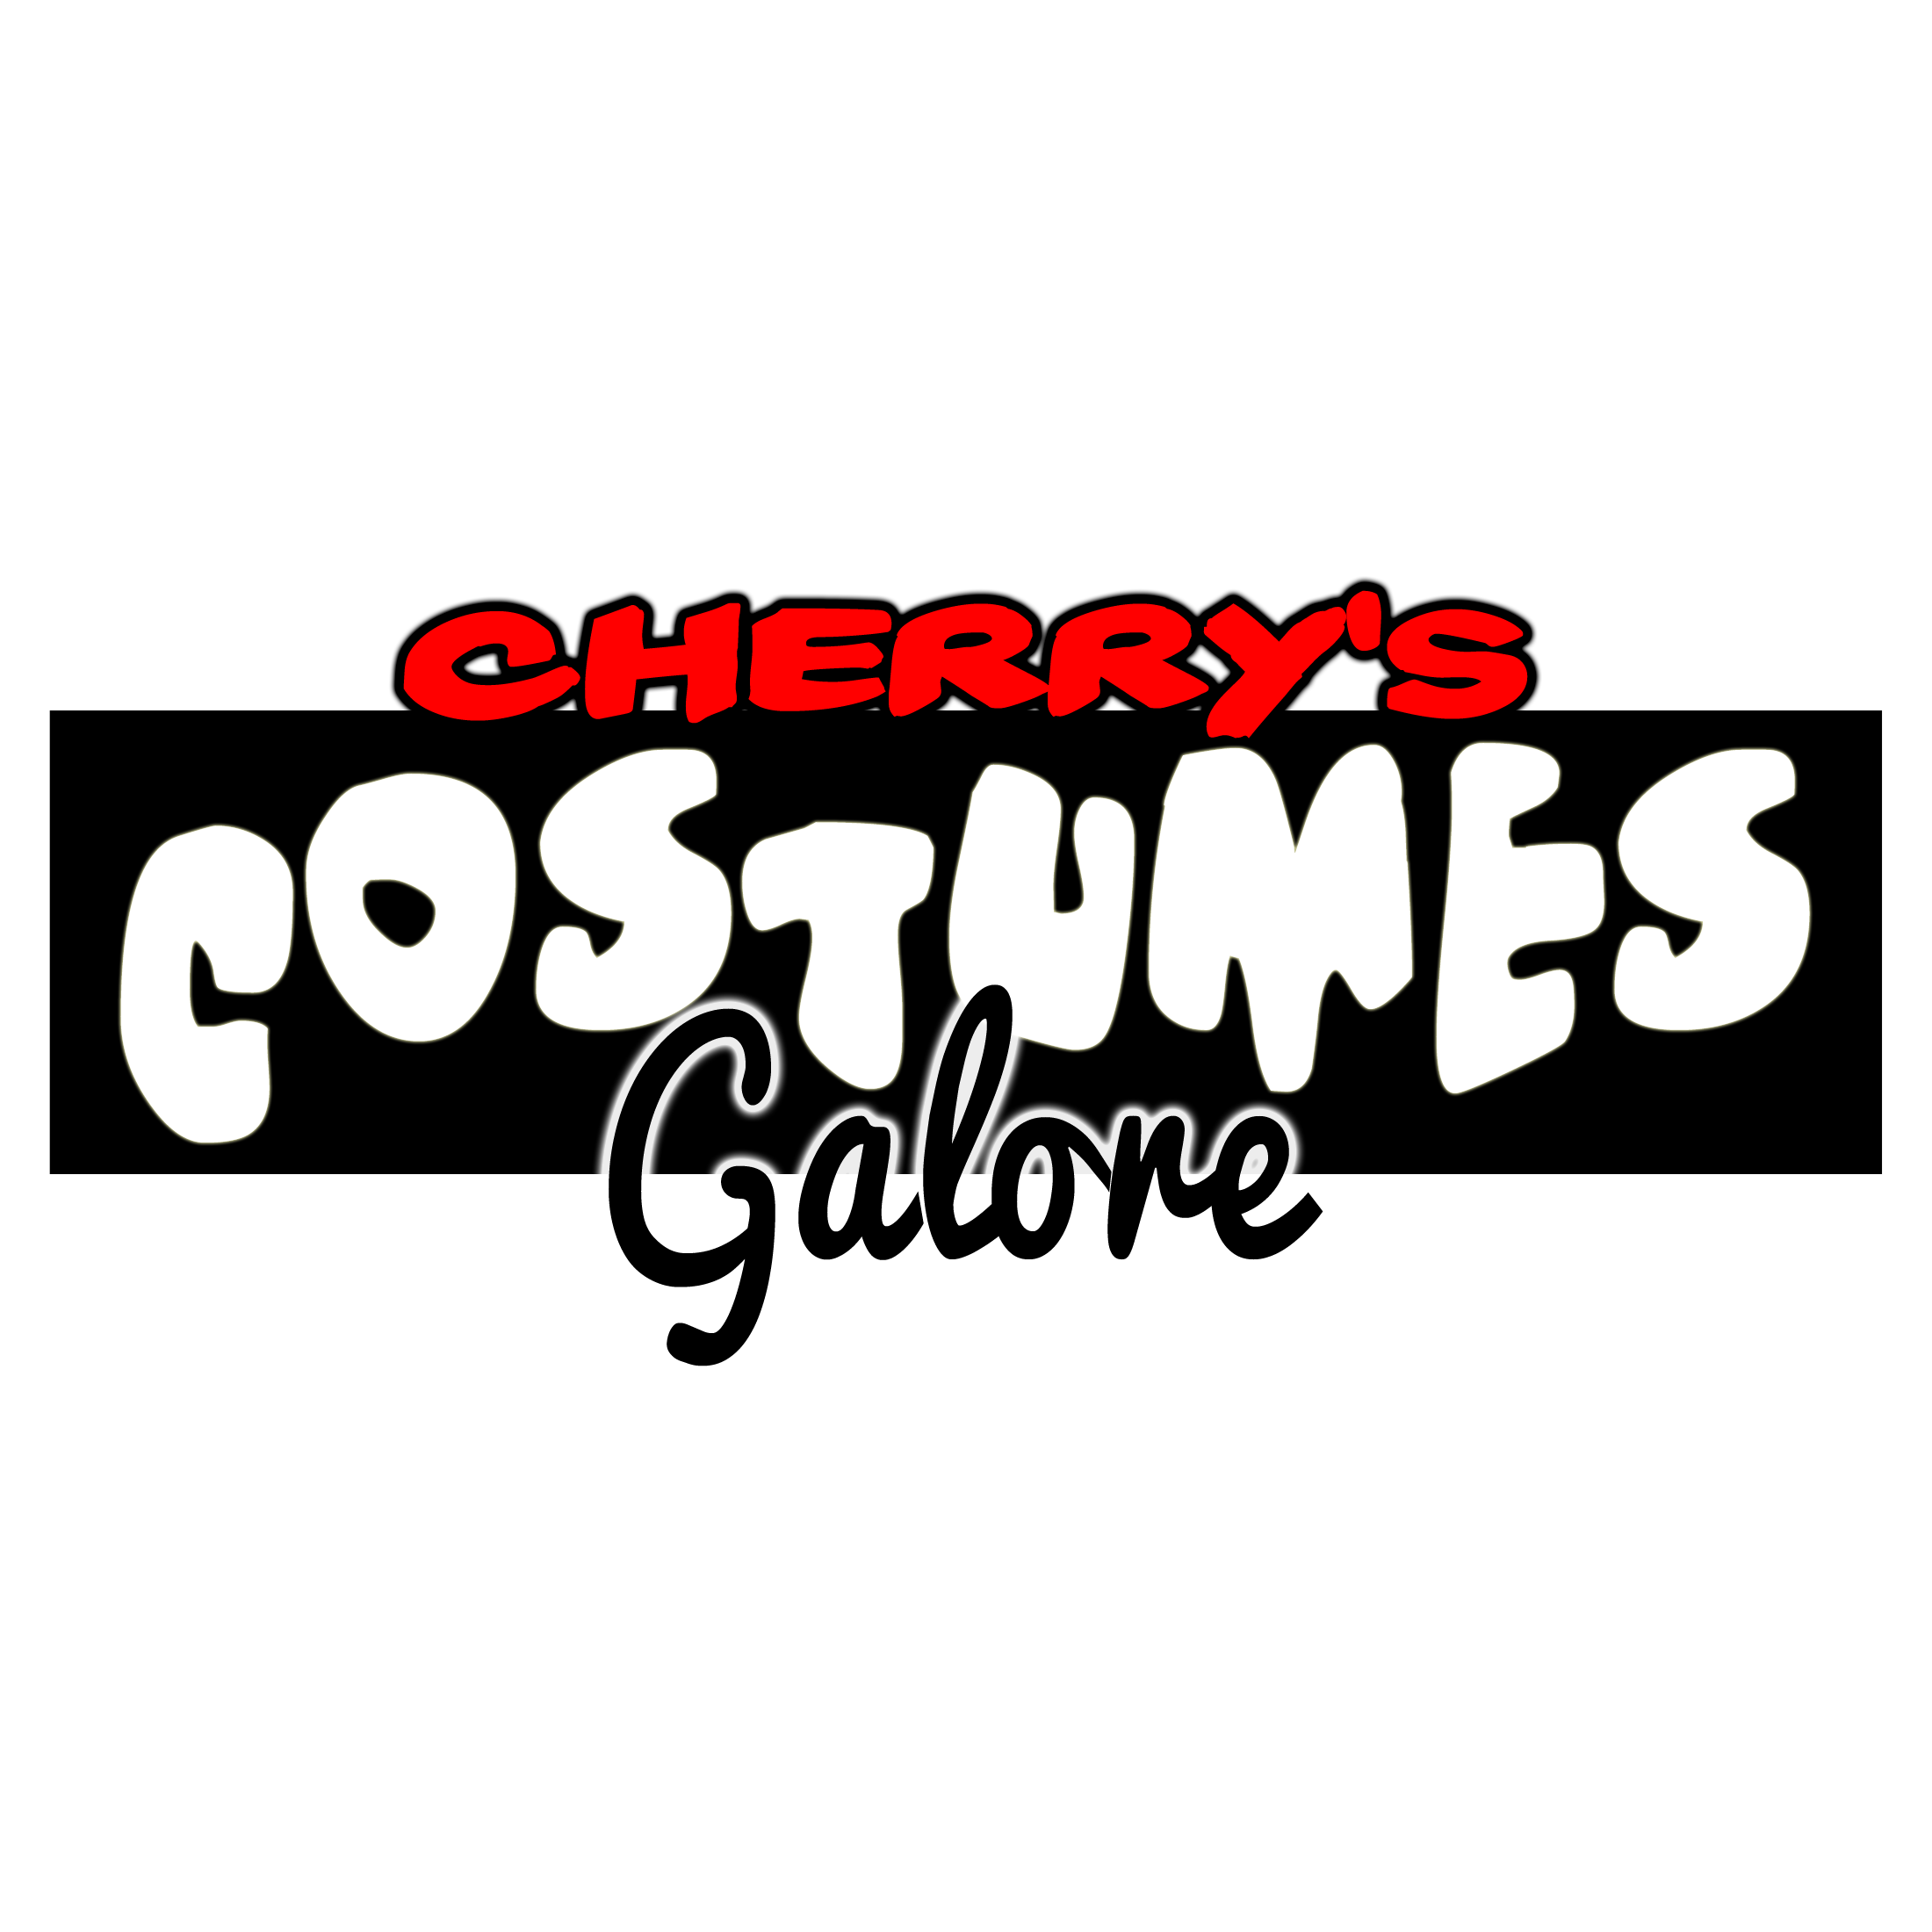 Cherry's Costumes Galore